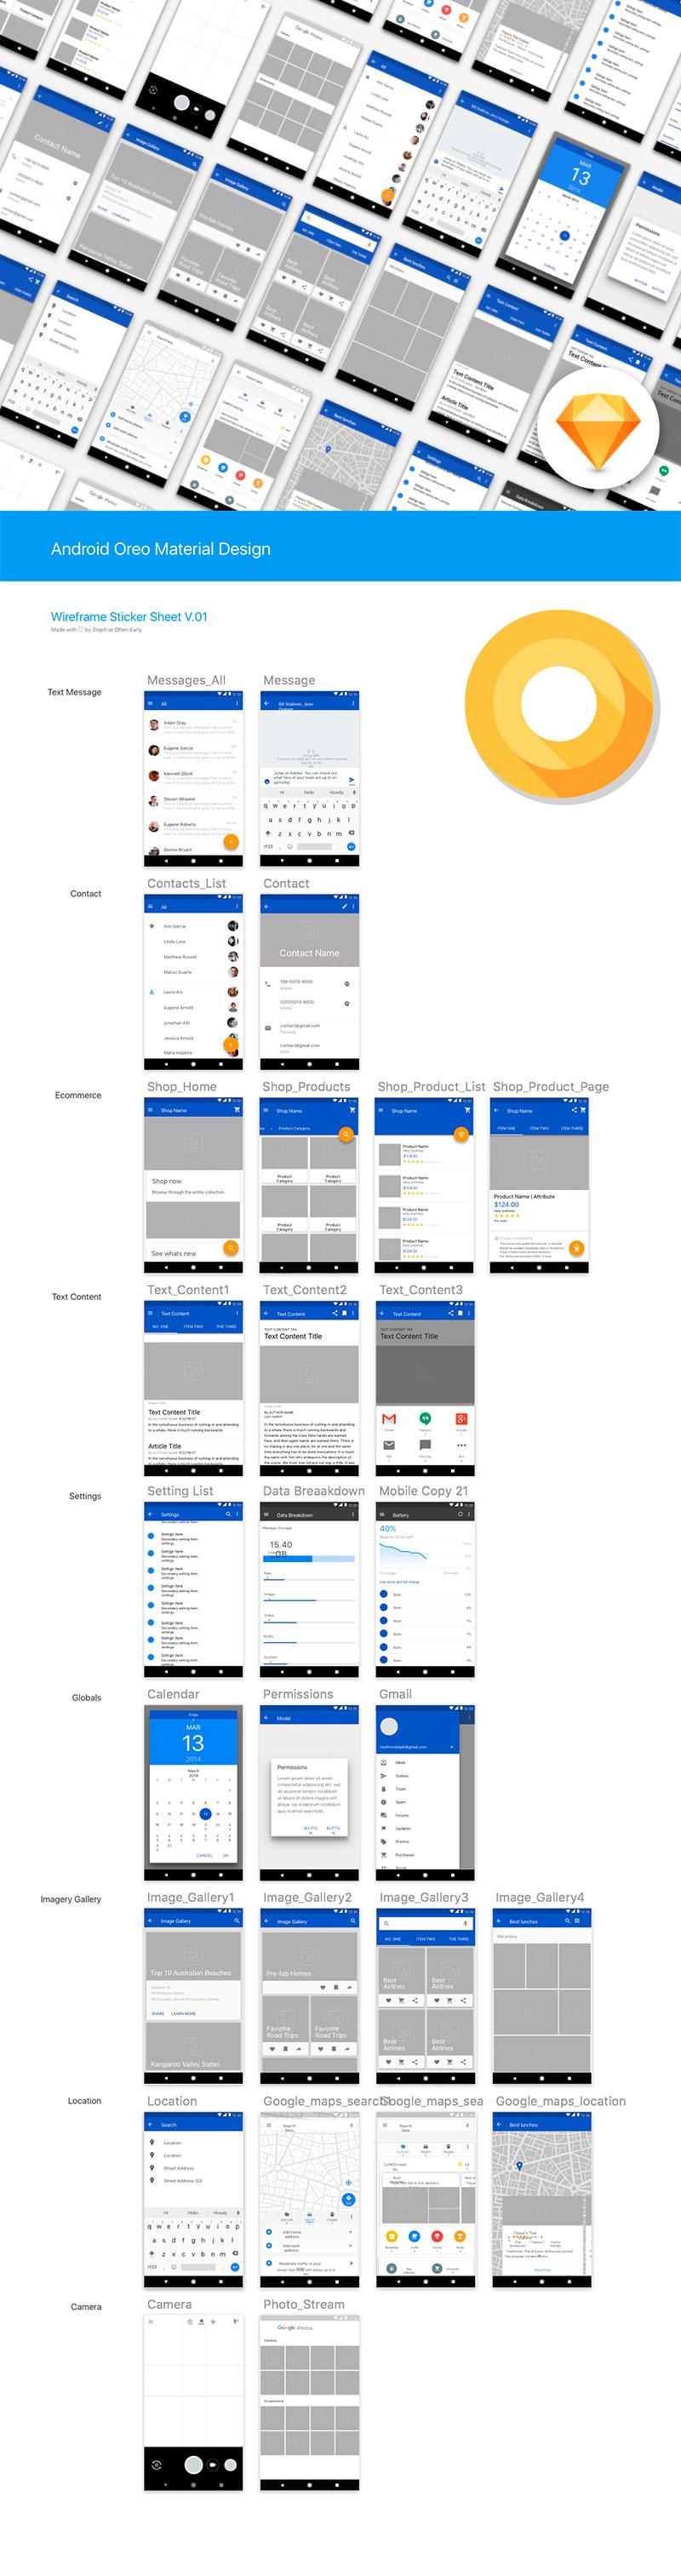 免费的安卓8.0(Android 8.0 Oreo)UI Kits下载 [Sketch]设计素材模板